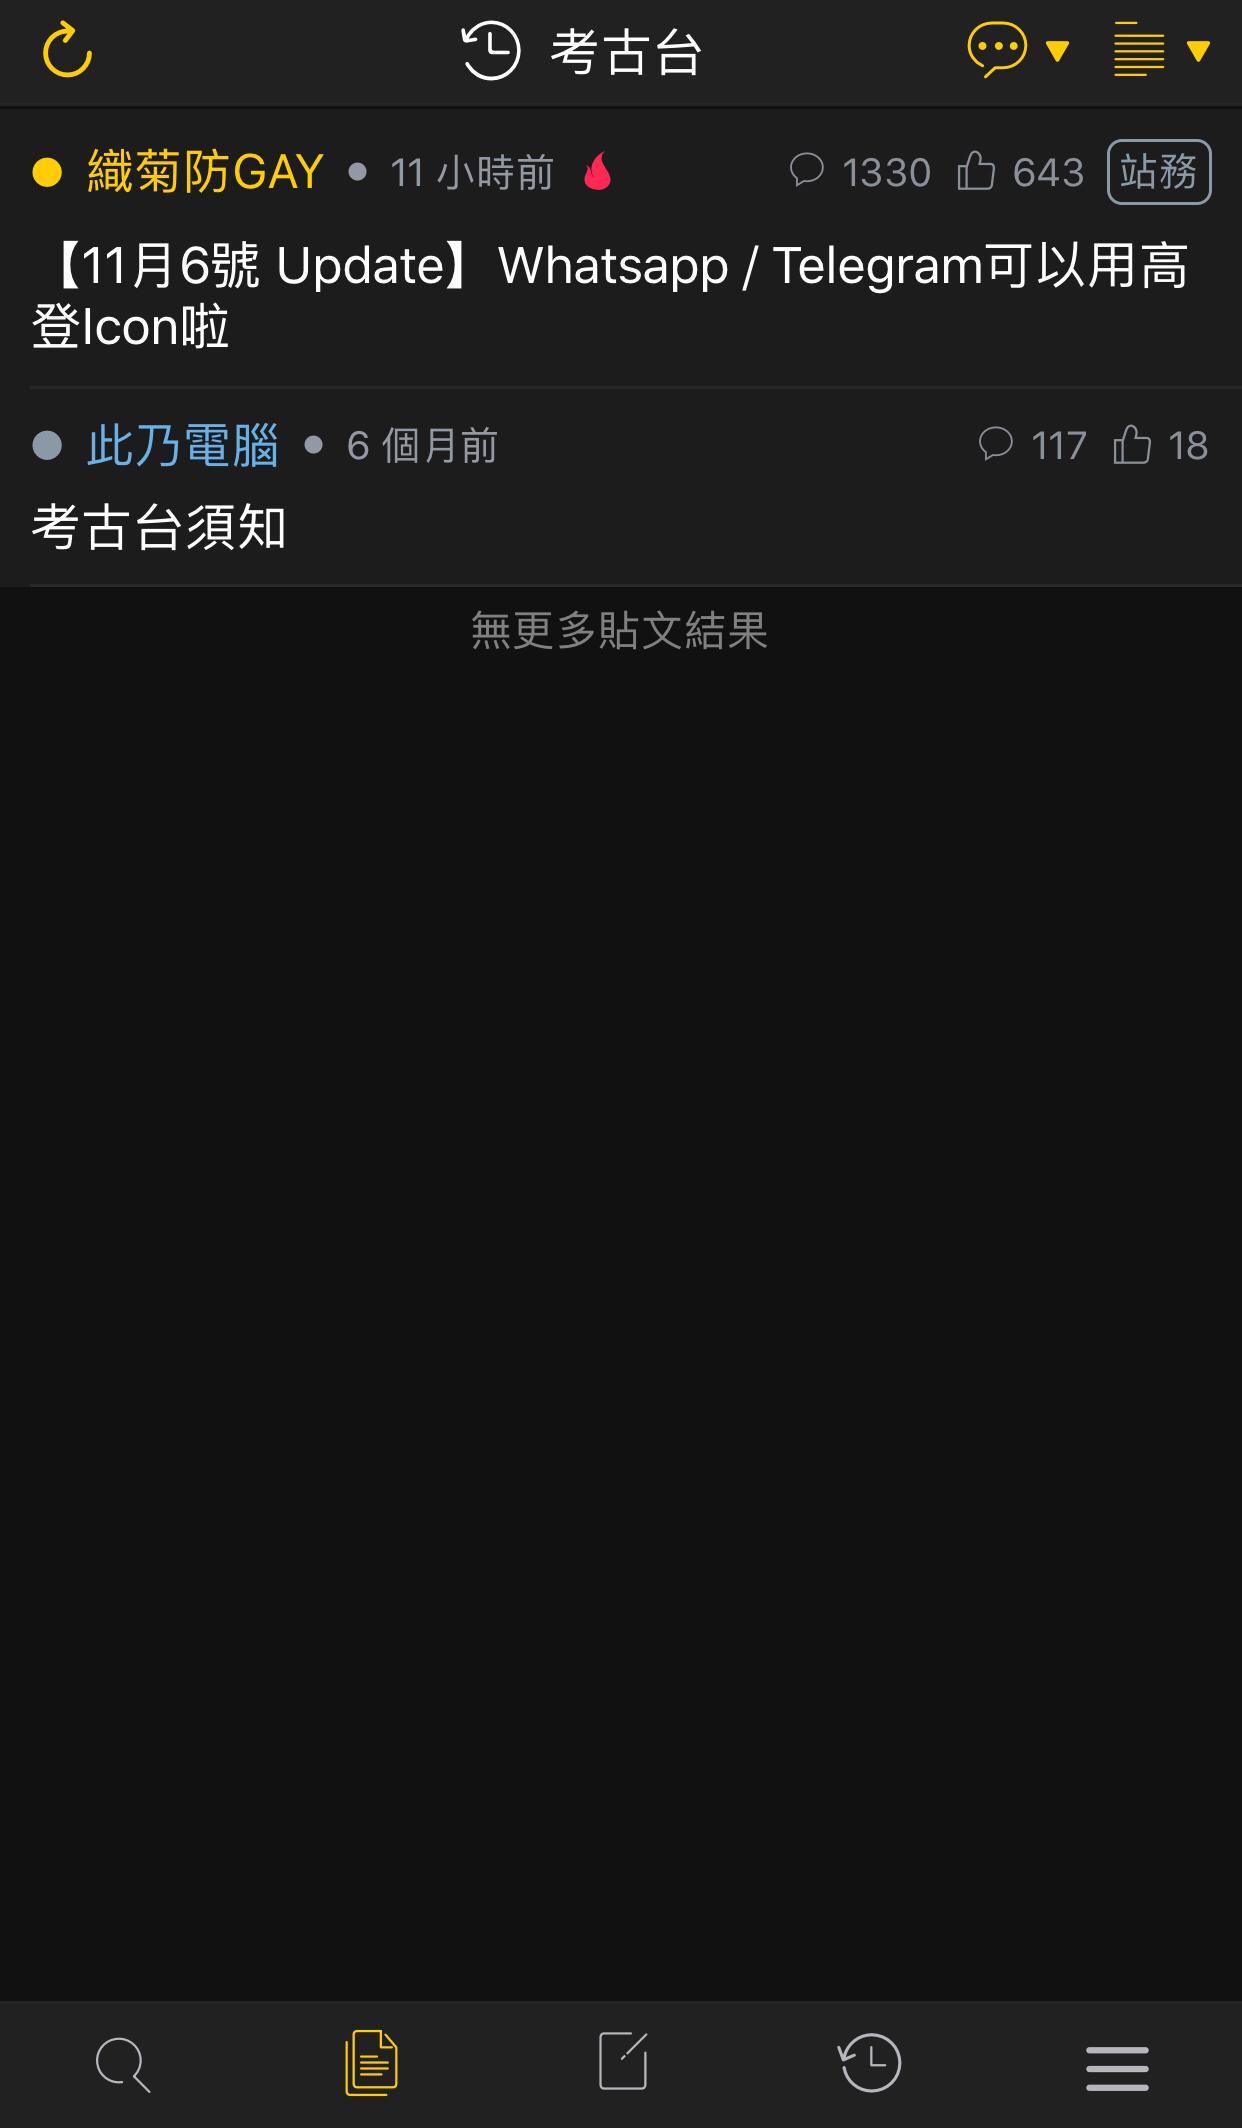 [img]https://upload.cc/i1/2019/01/08/3tines.png[/img]